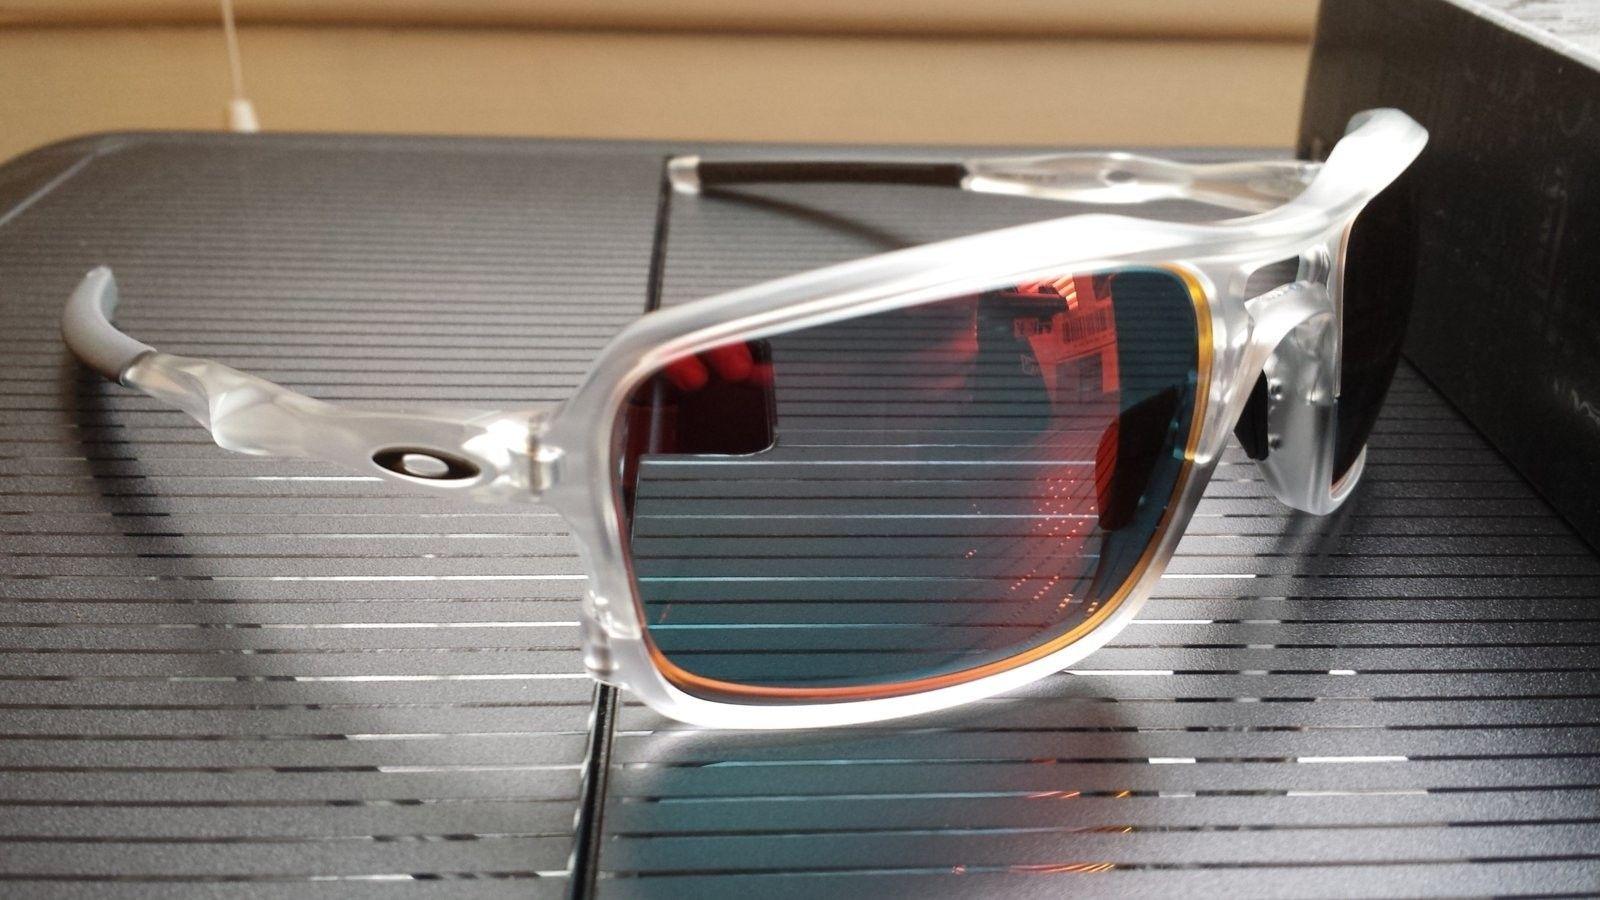 Matte Clear/ Torch Triggerman - 20160612_133105.jpg